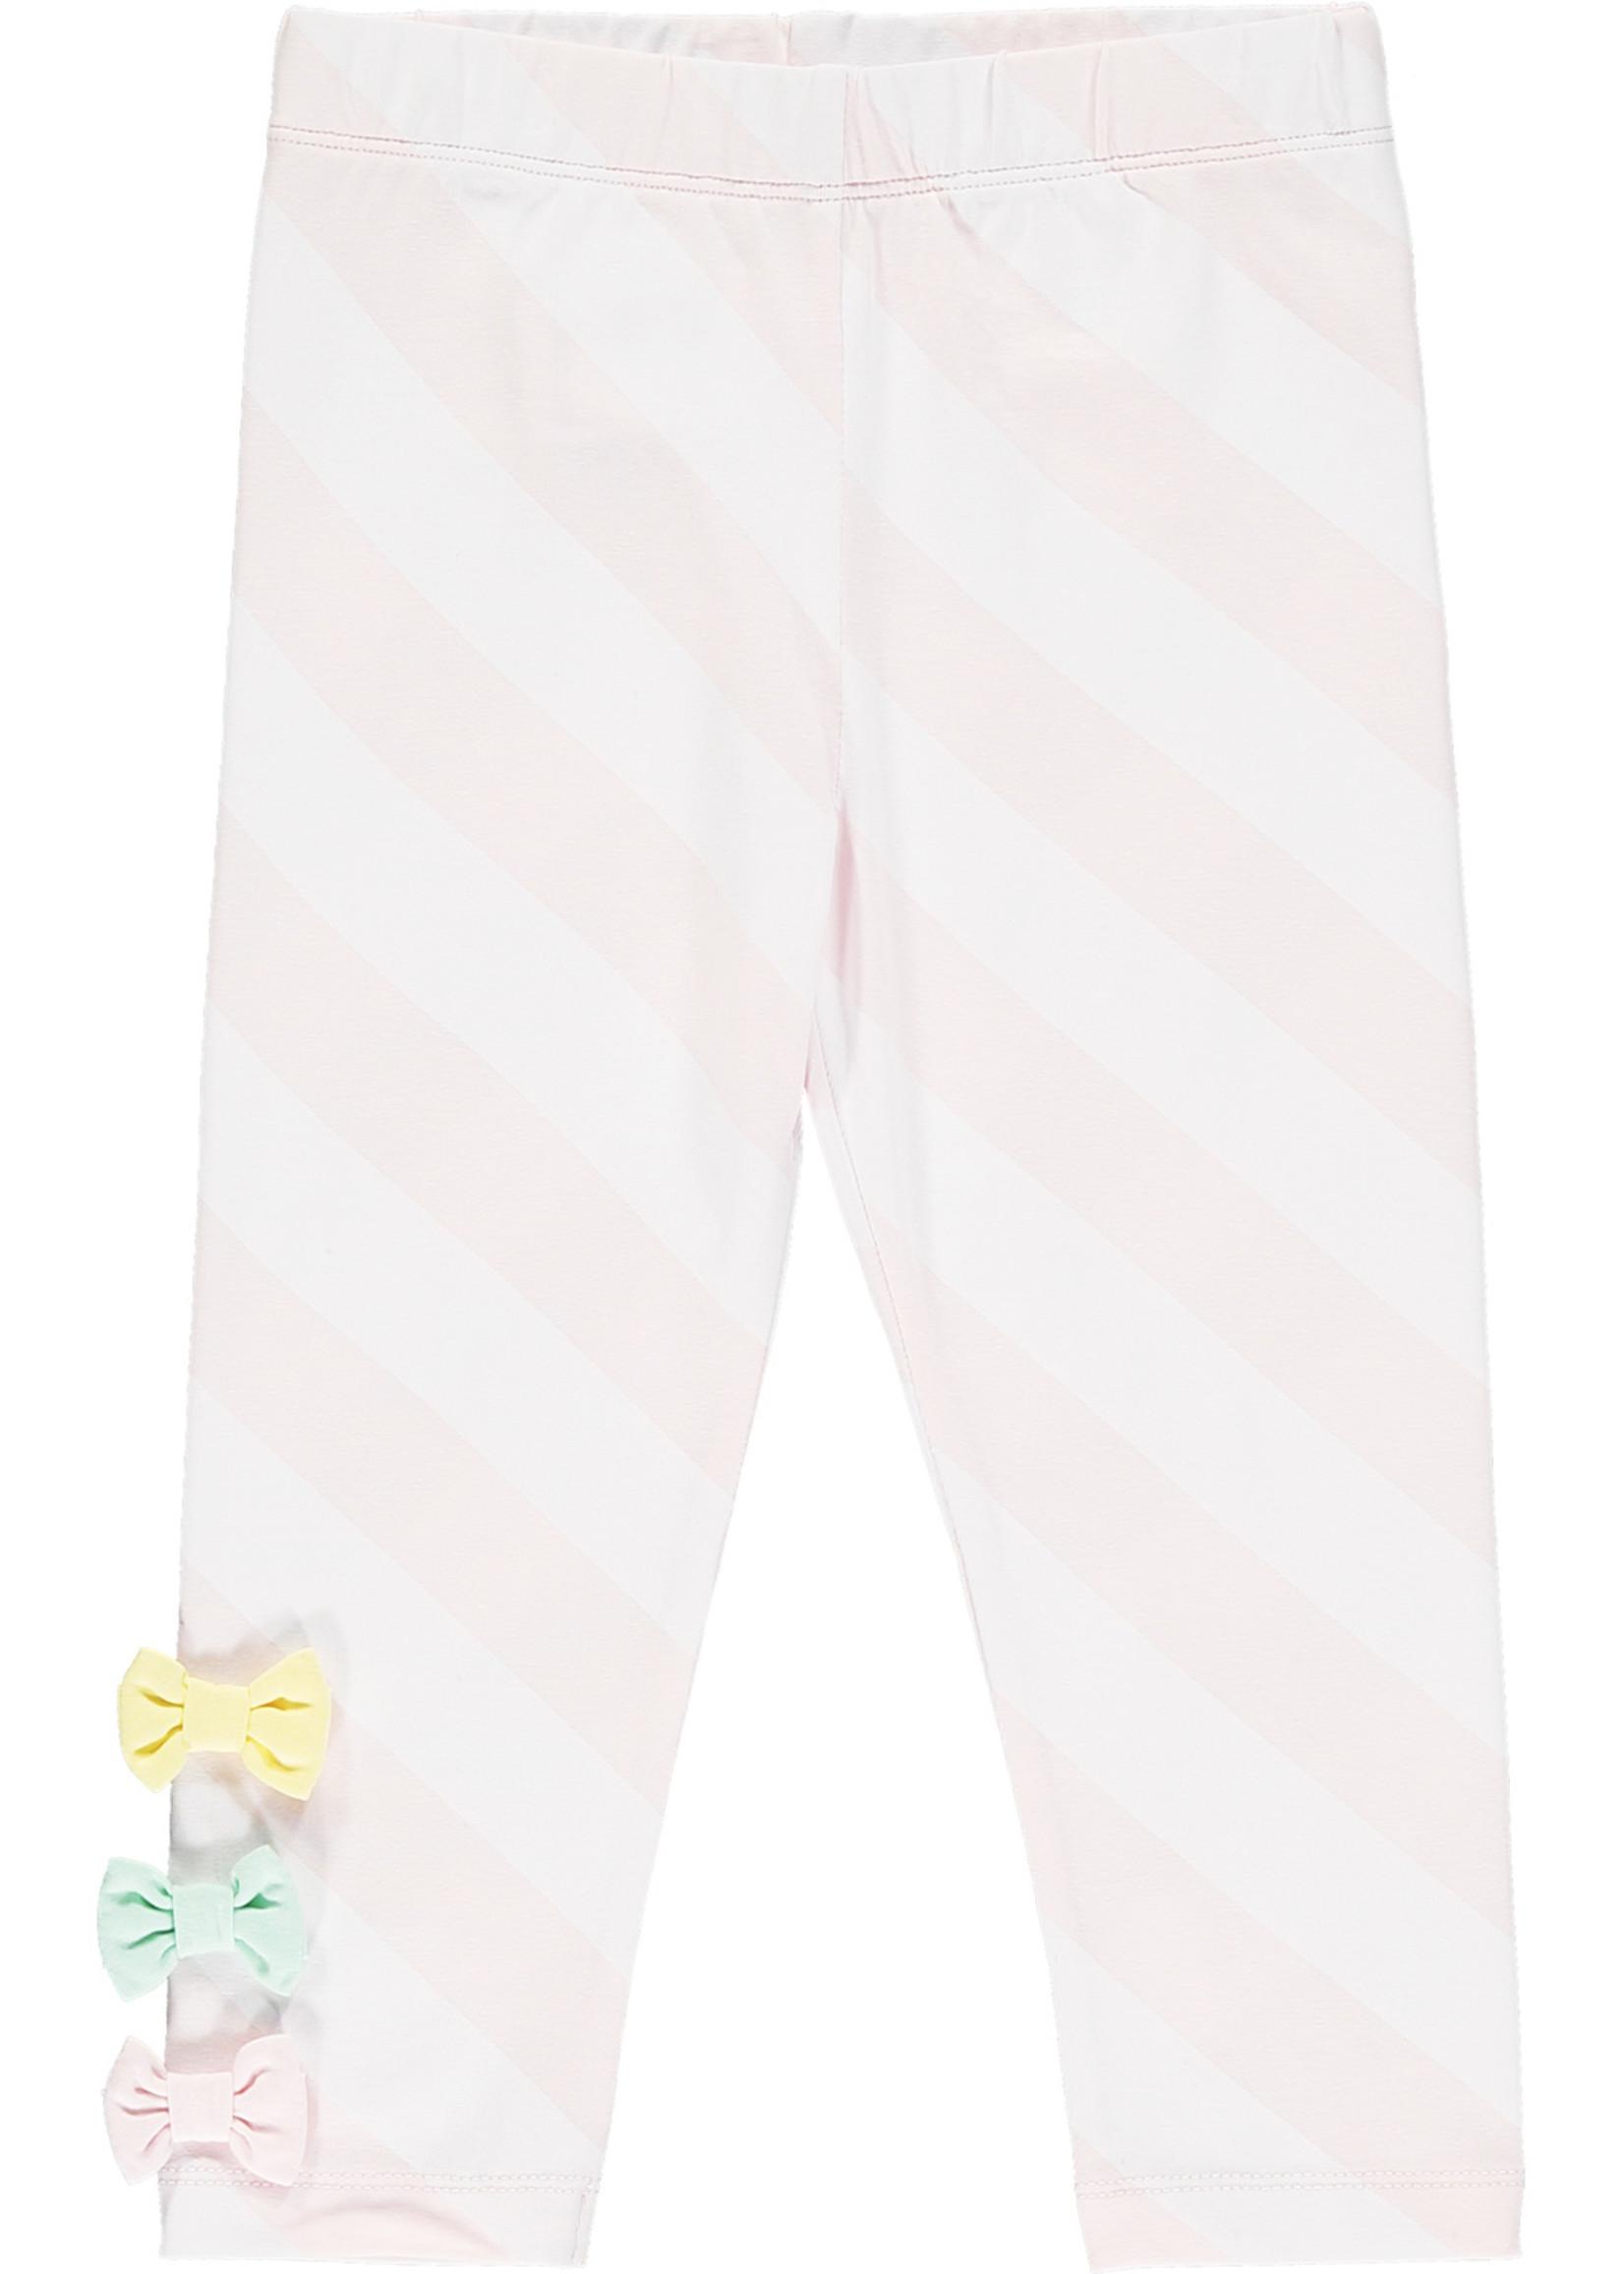 A Dee Olivia 2 piece legging set bow details